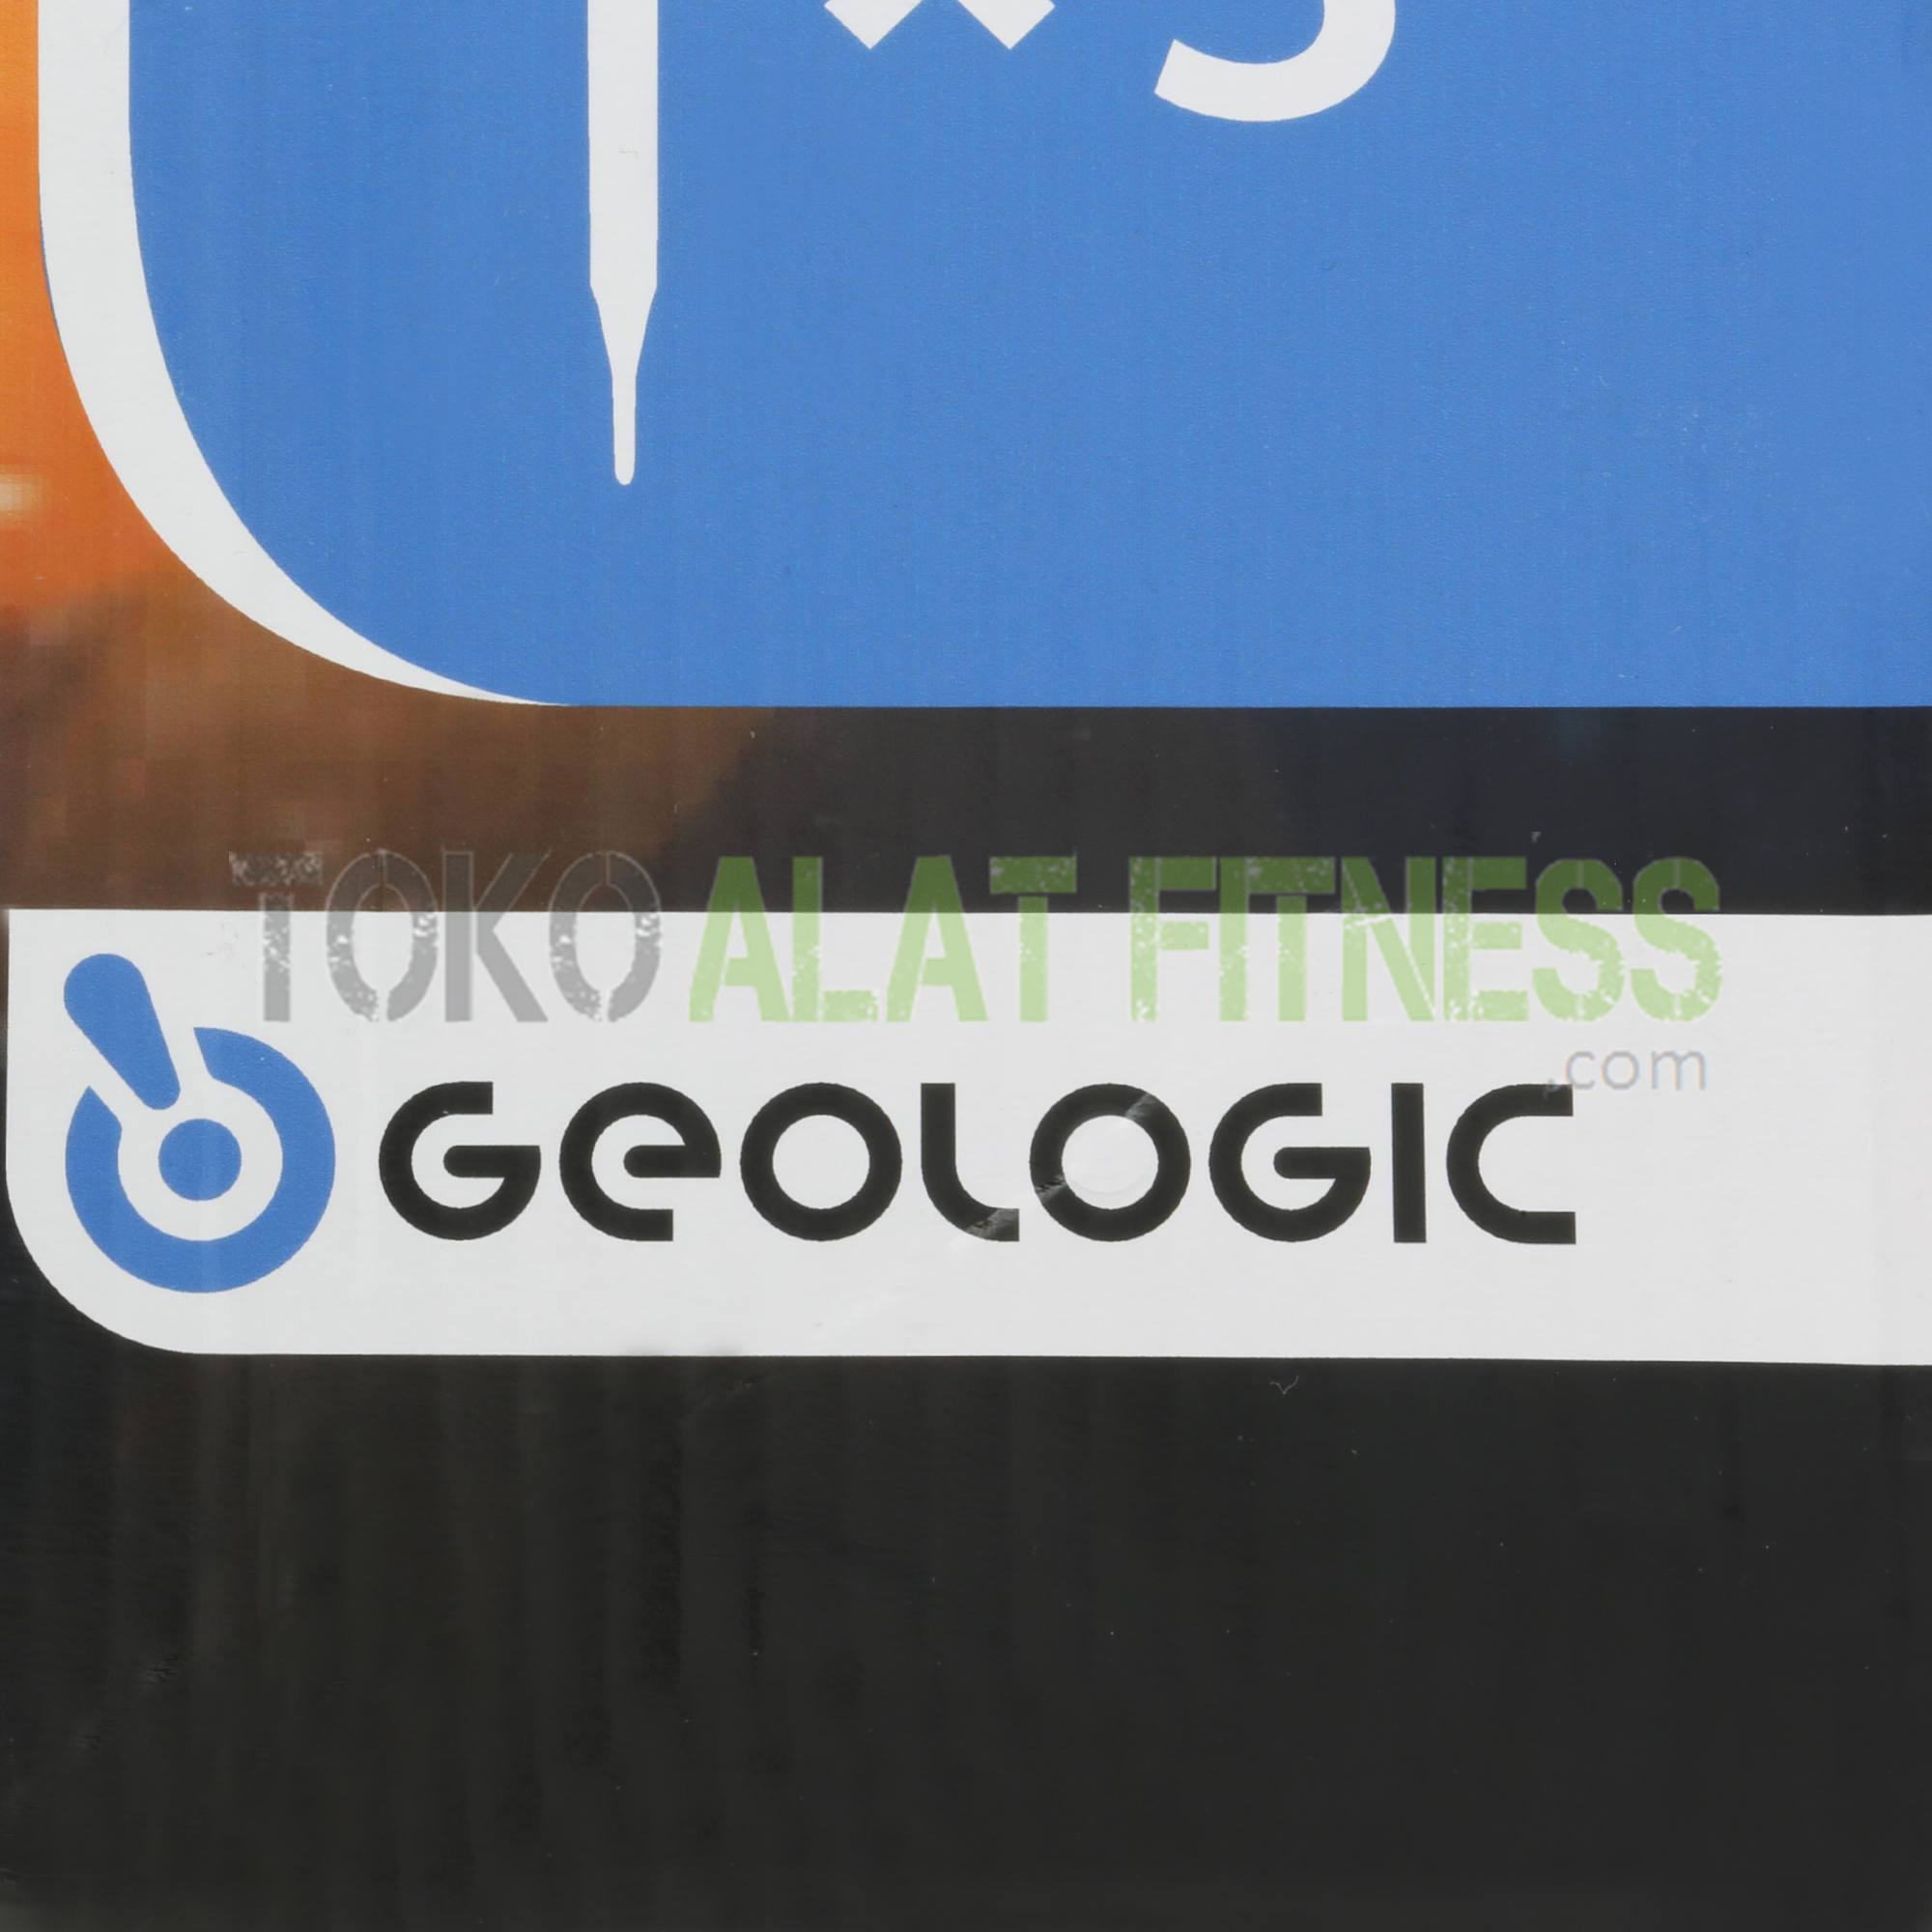 plastip dartboard geologic 8305574 288012 - Papan Dart Board Gelogic